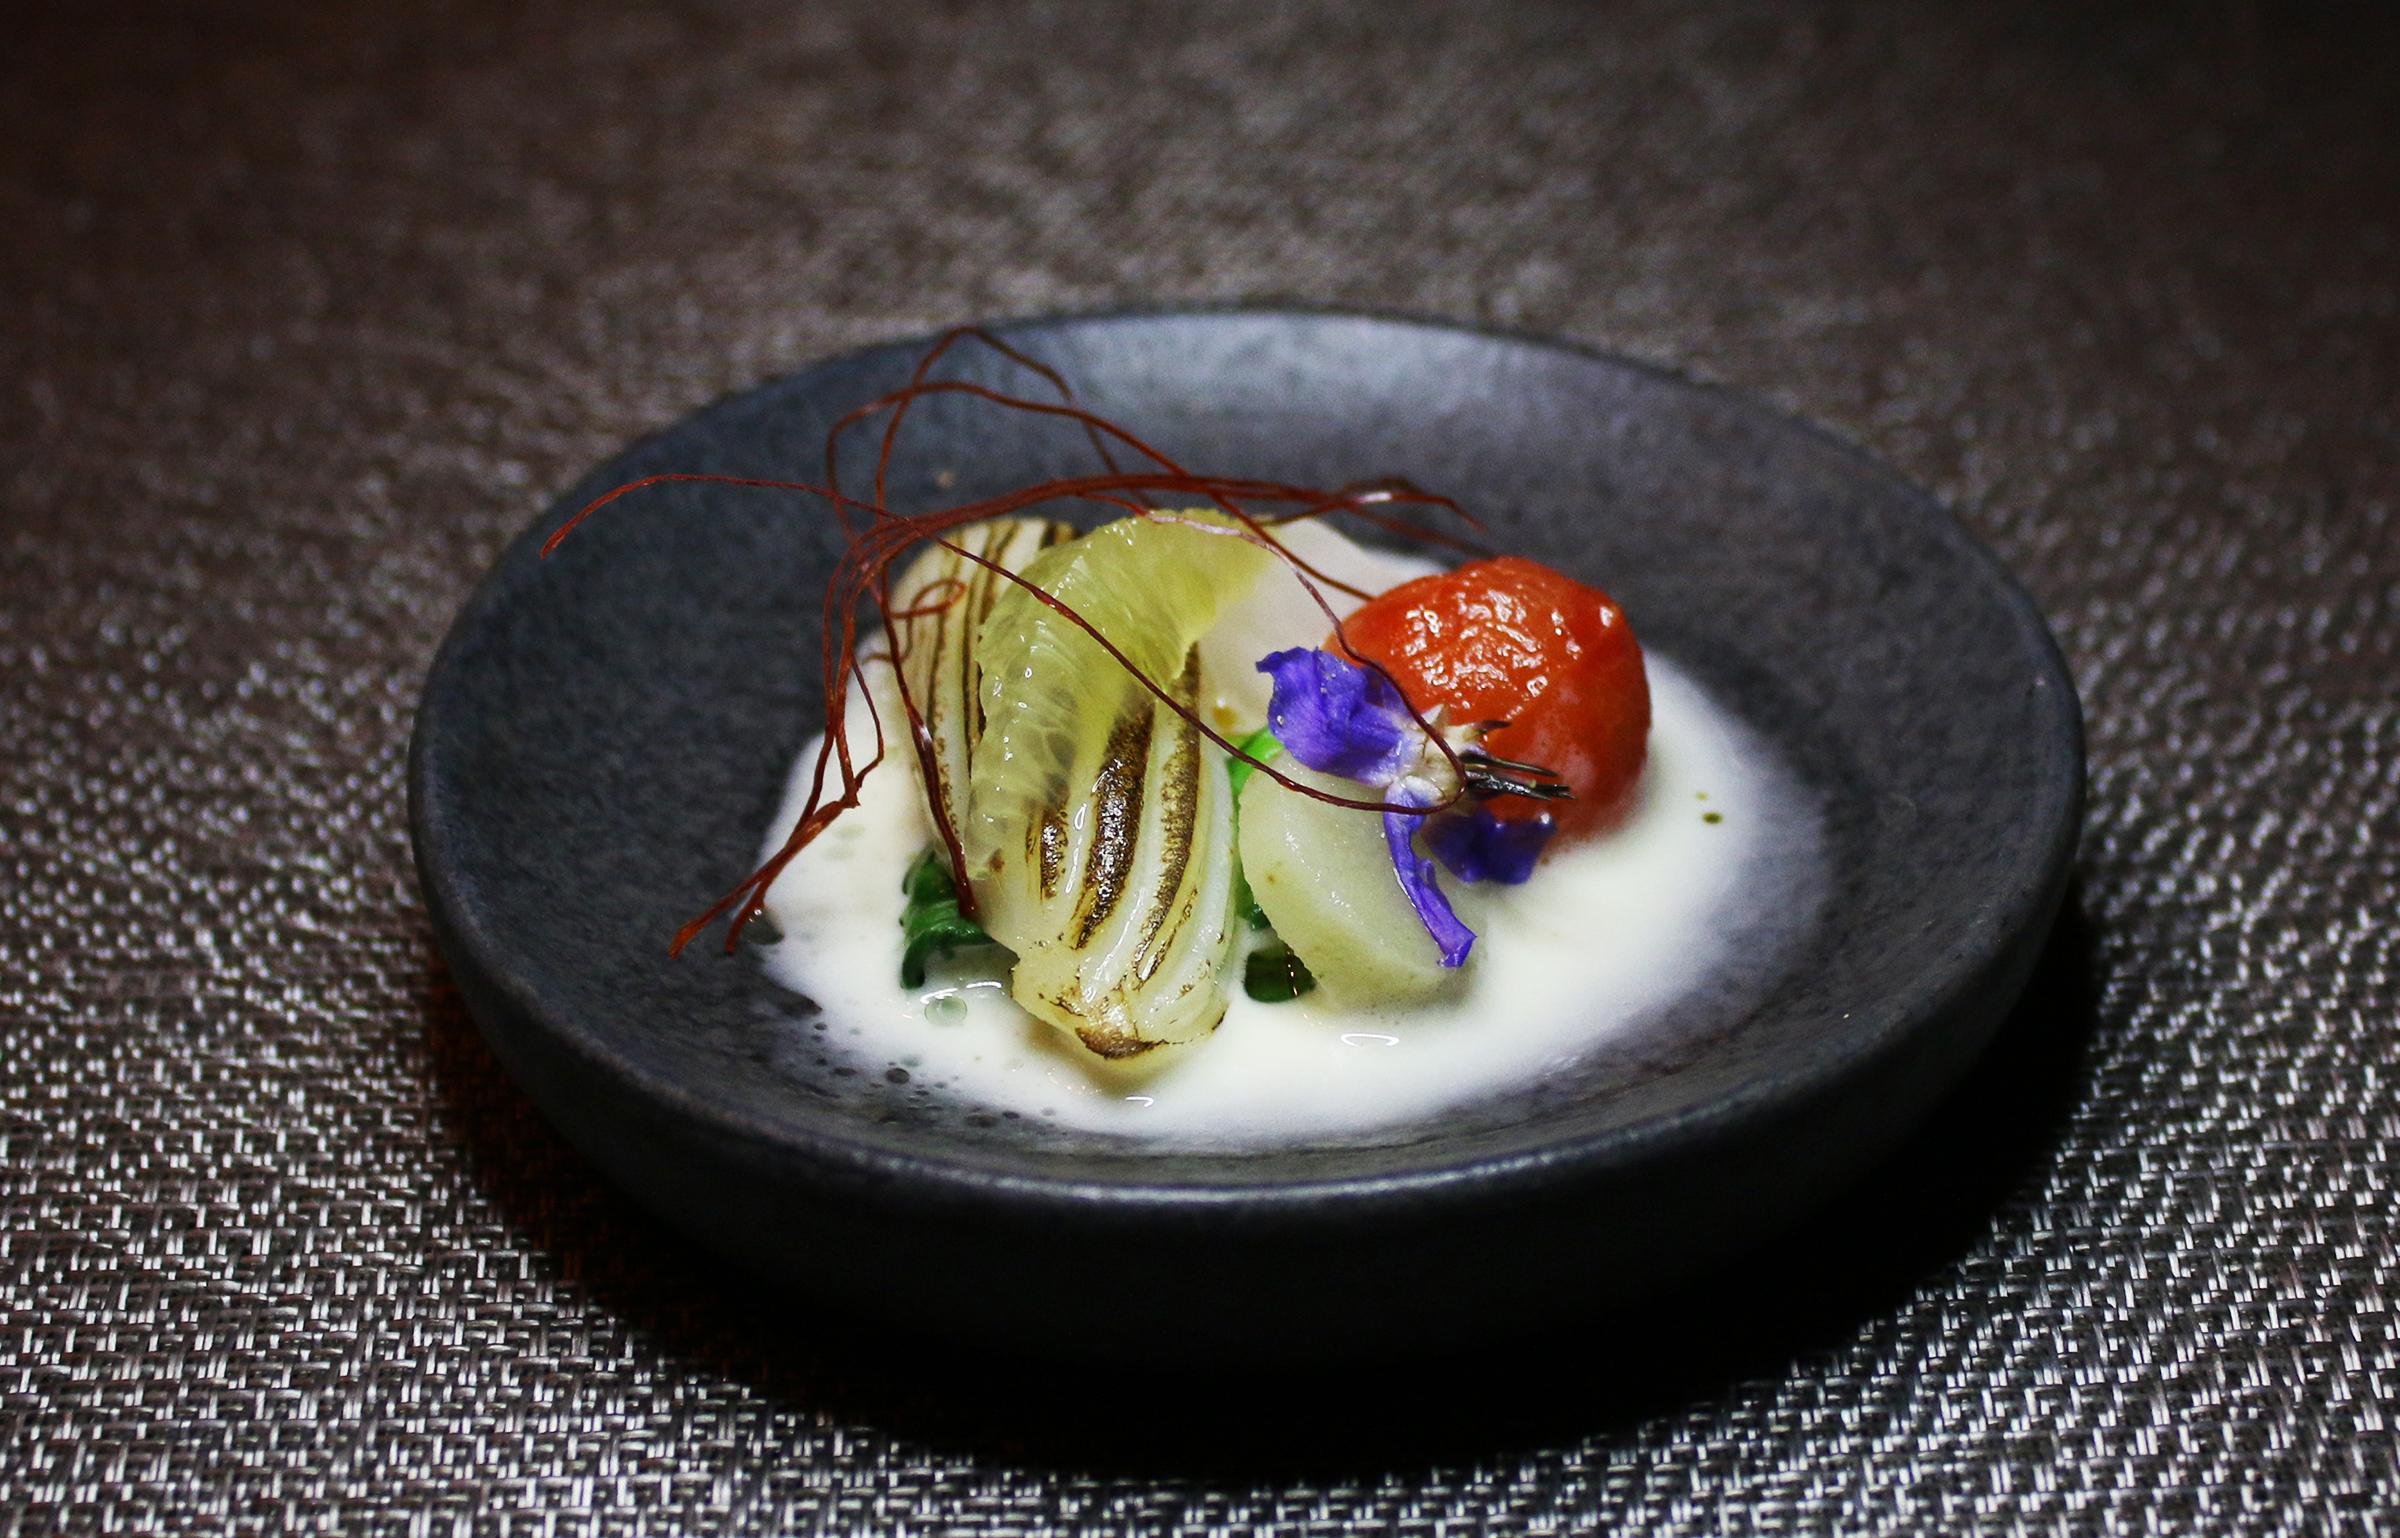 Cuttlefish: Sake Lemon Grass Reduction, Burdock Root, Pickled Daikon Radish